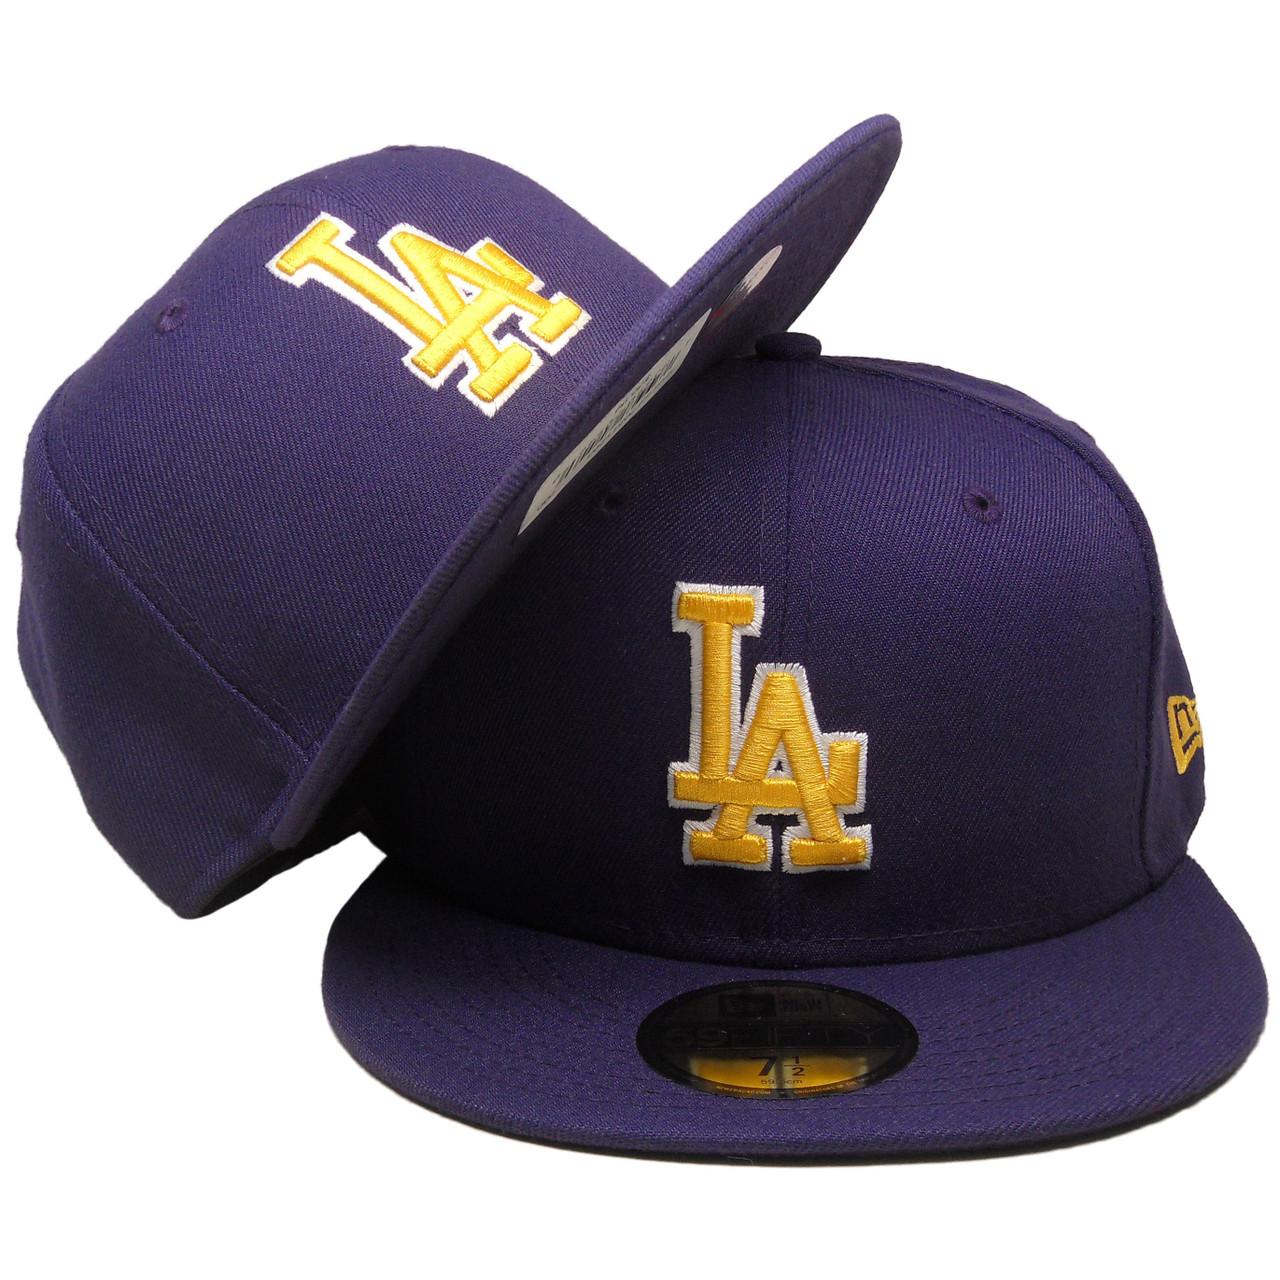 9407e9fc8b04b Los Angeles Dodgers New Era Custom 59Fifty Fitted - Purple